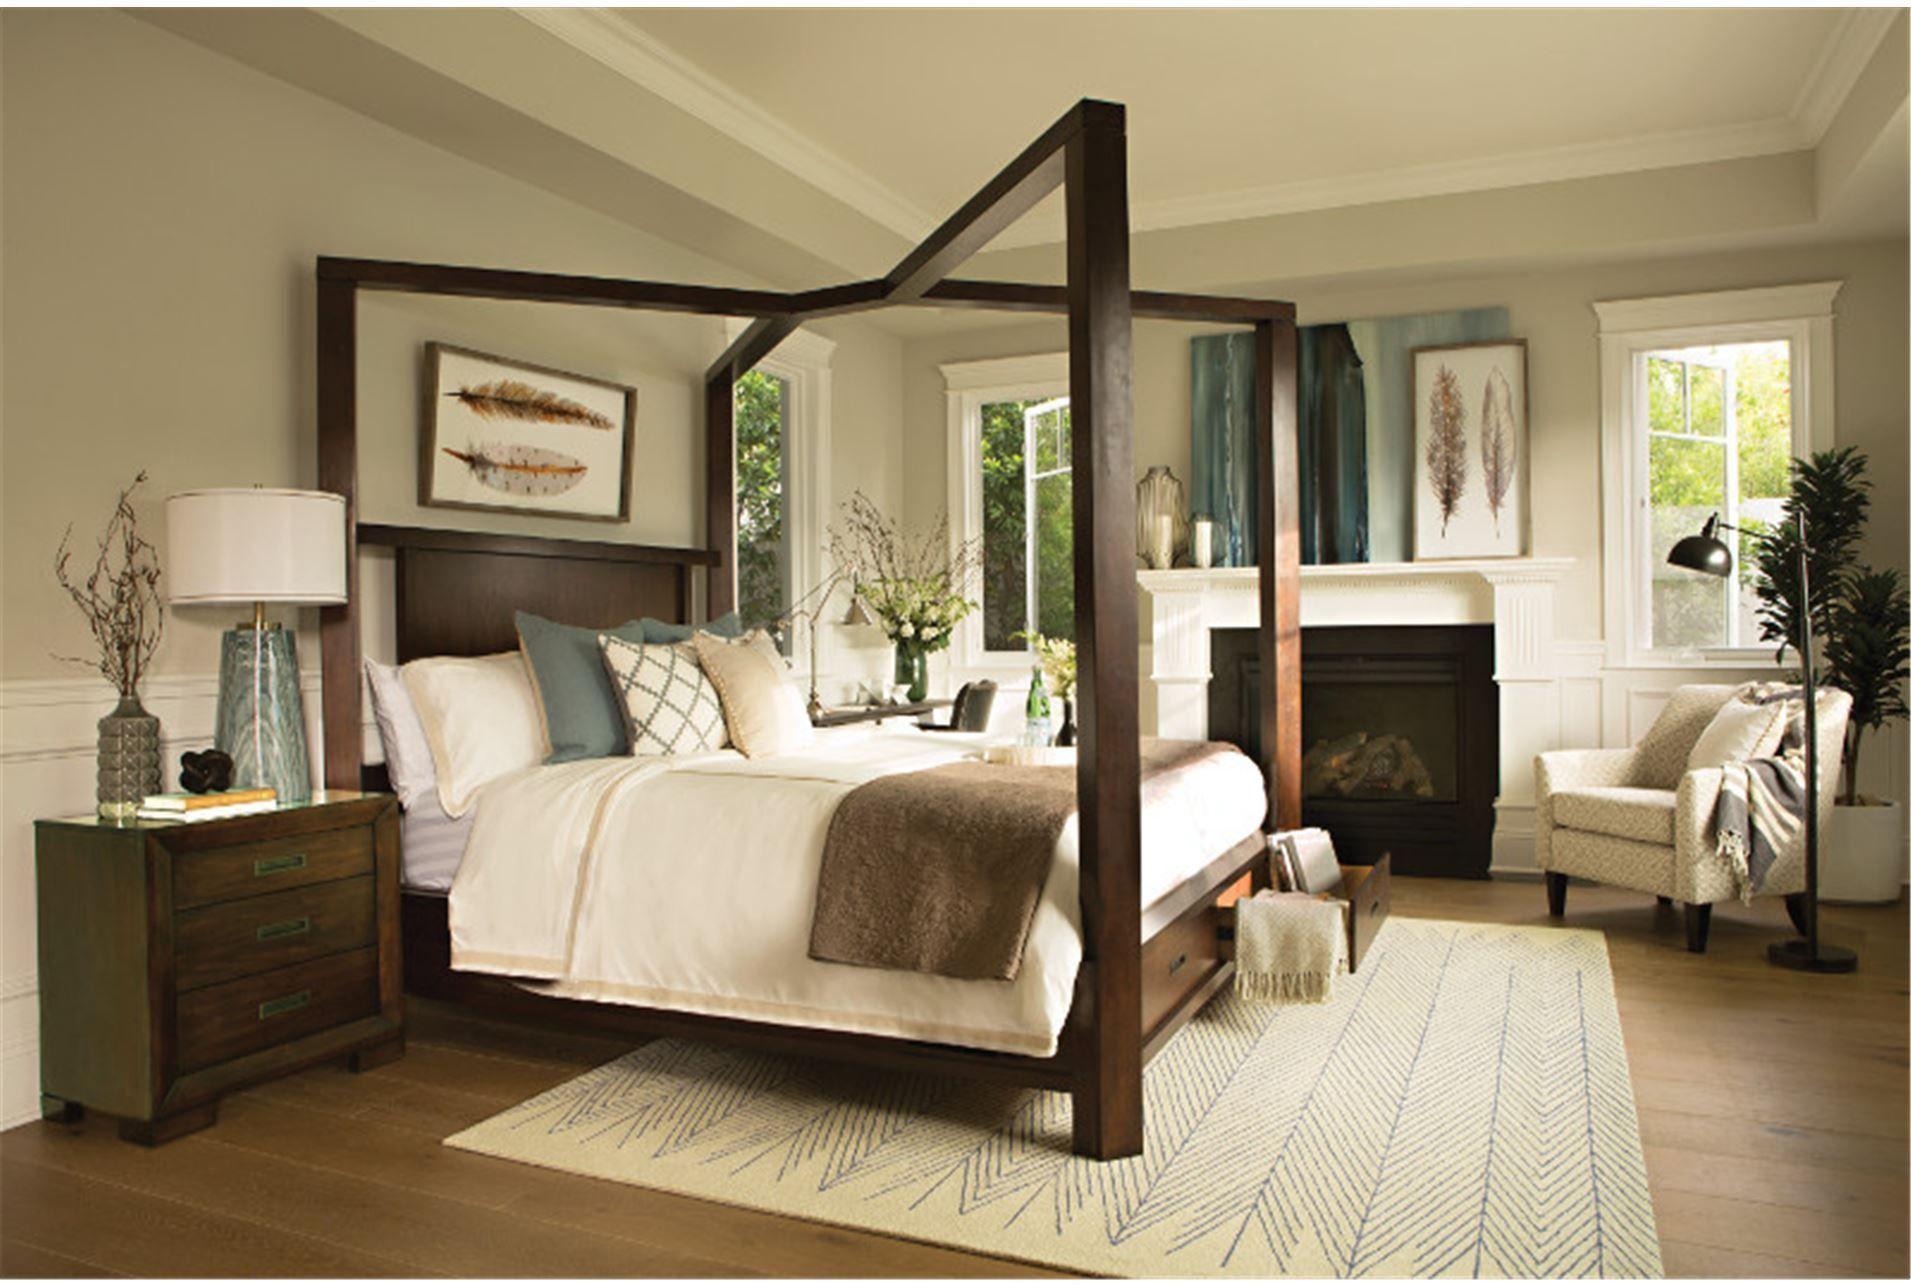 California King Canopy W/Storage Bed, Tesla, Medium brown | Storage ...